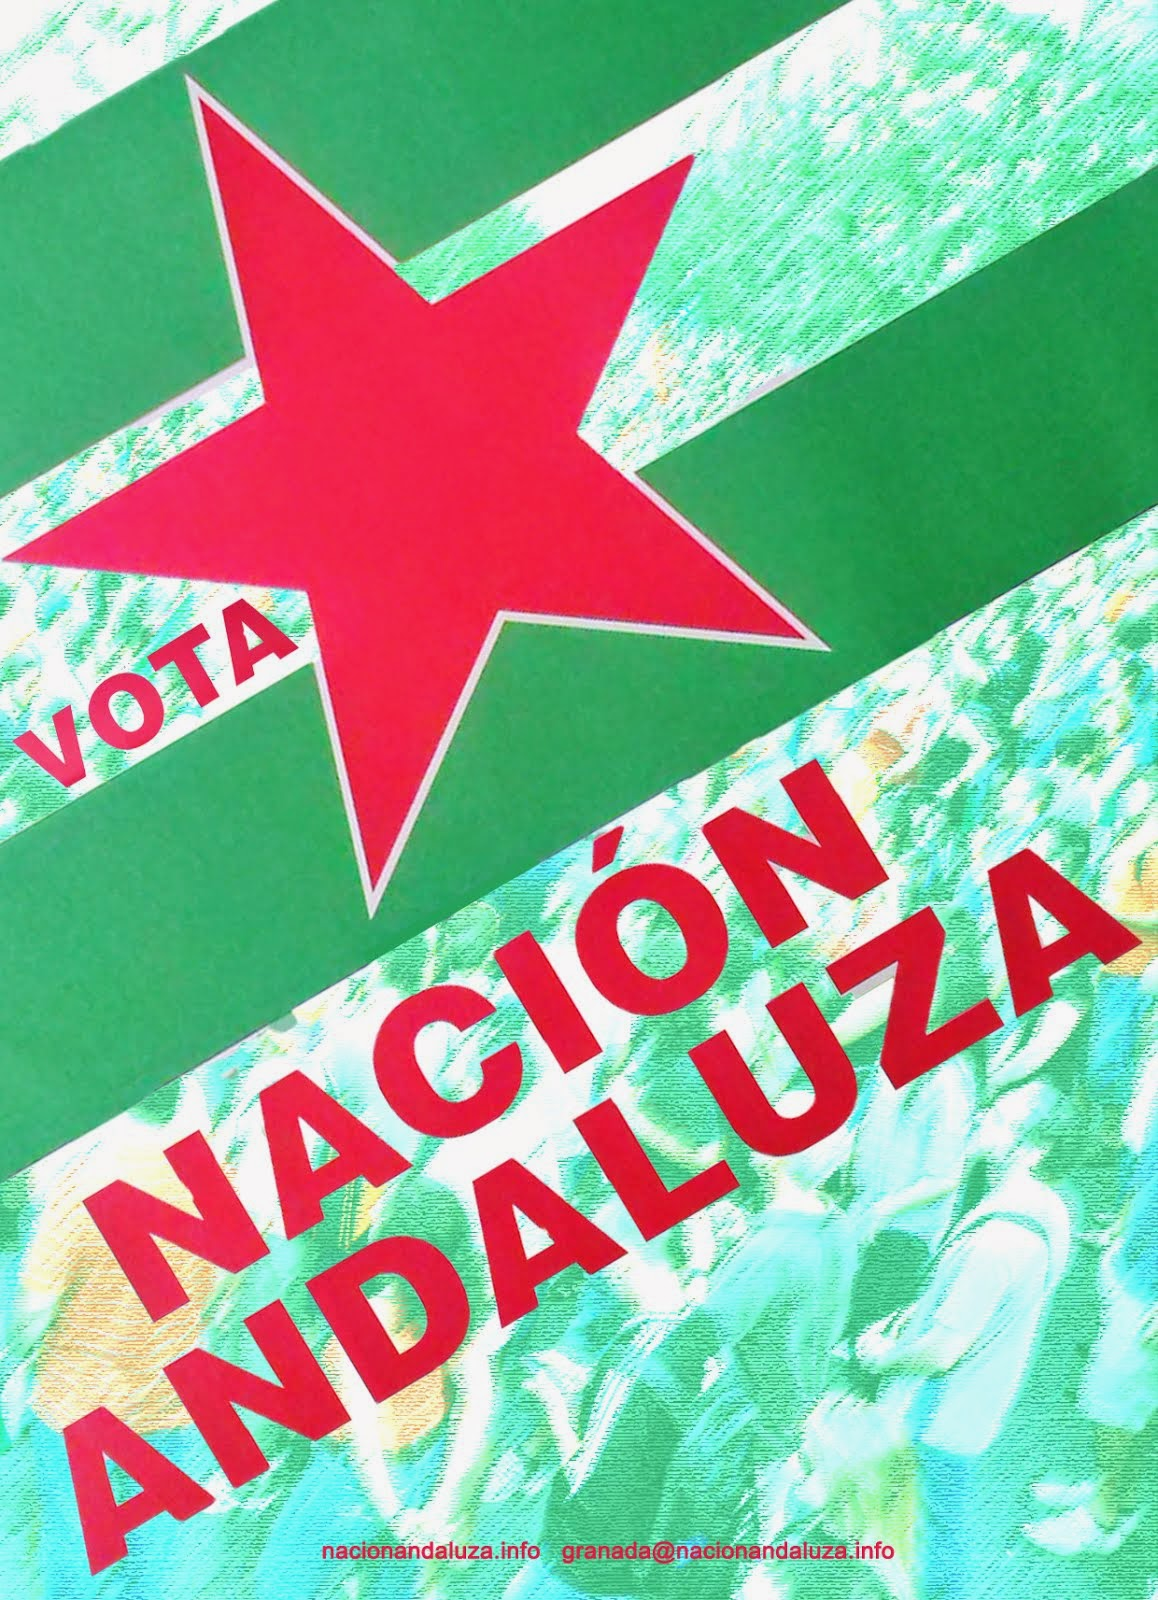 Dale donde les duele. Vota Nación Andaluza